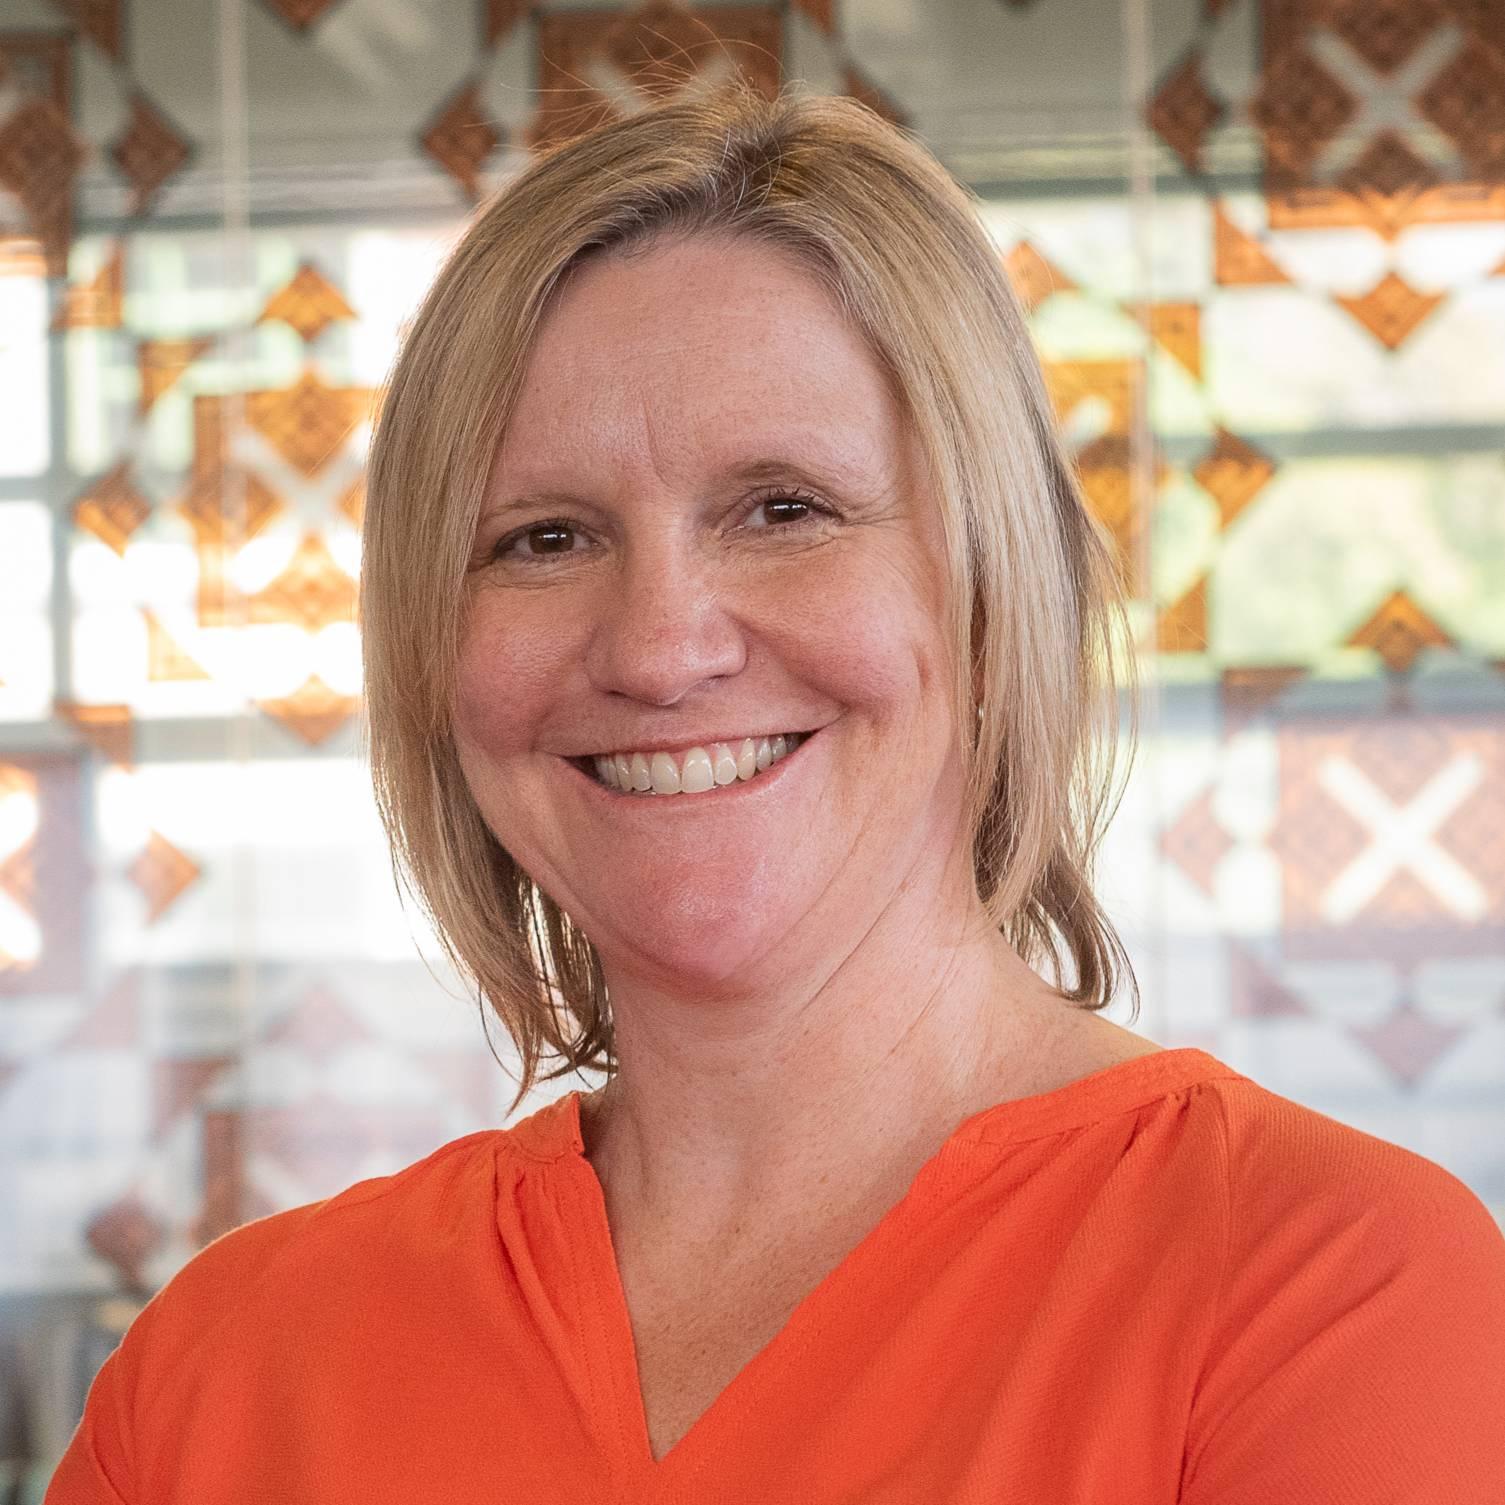 Sarah Leggott profile picture photograph